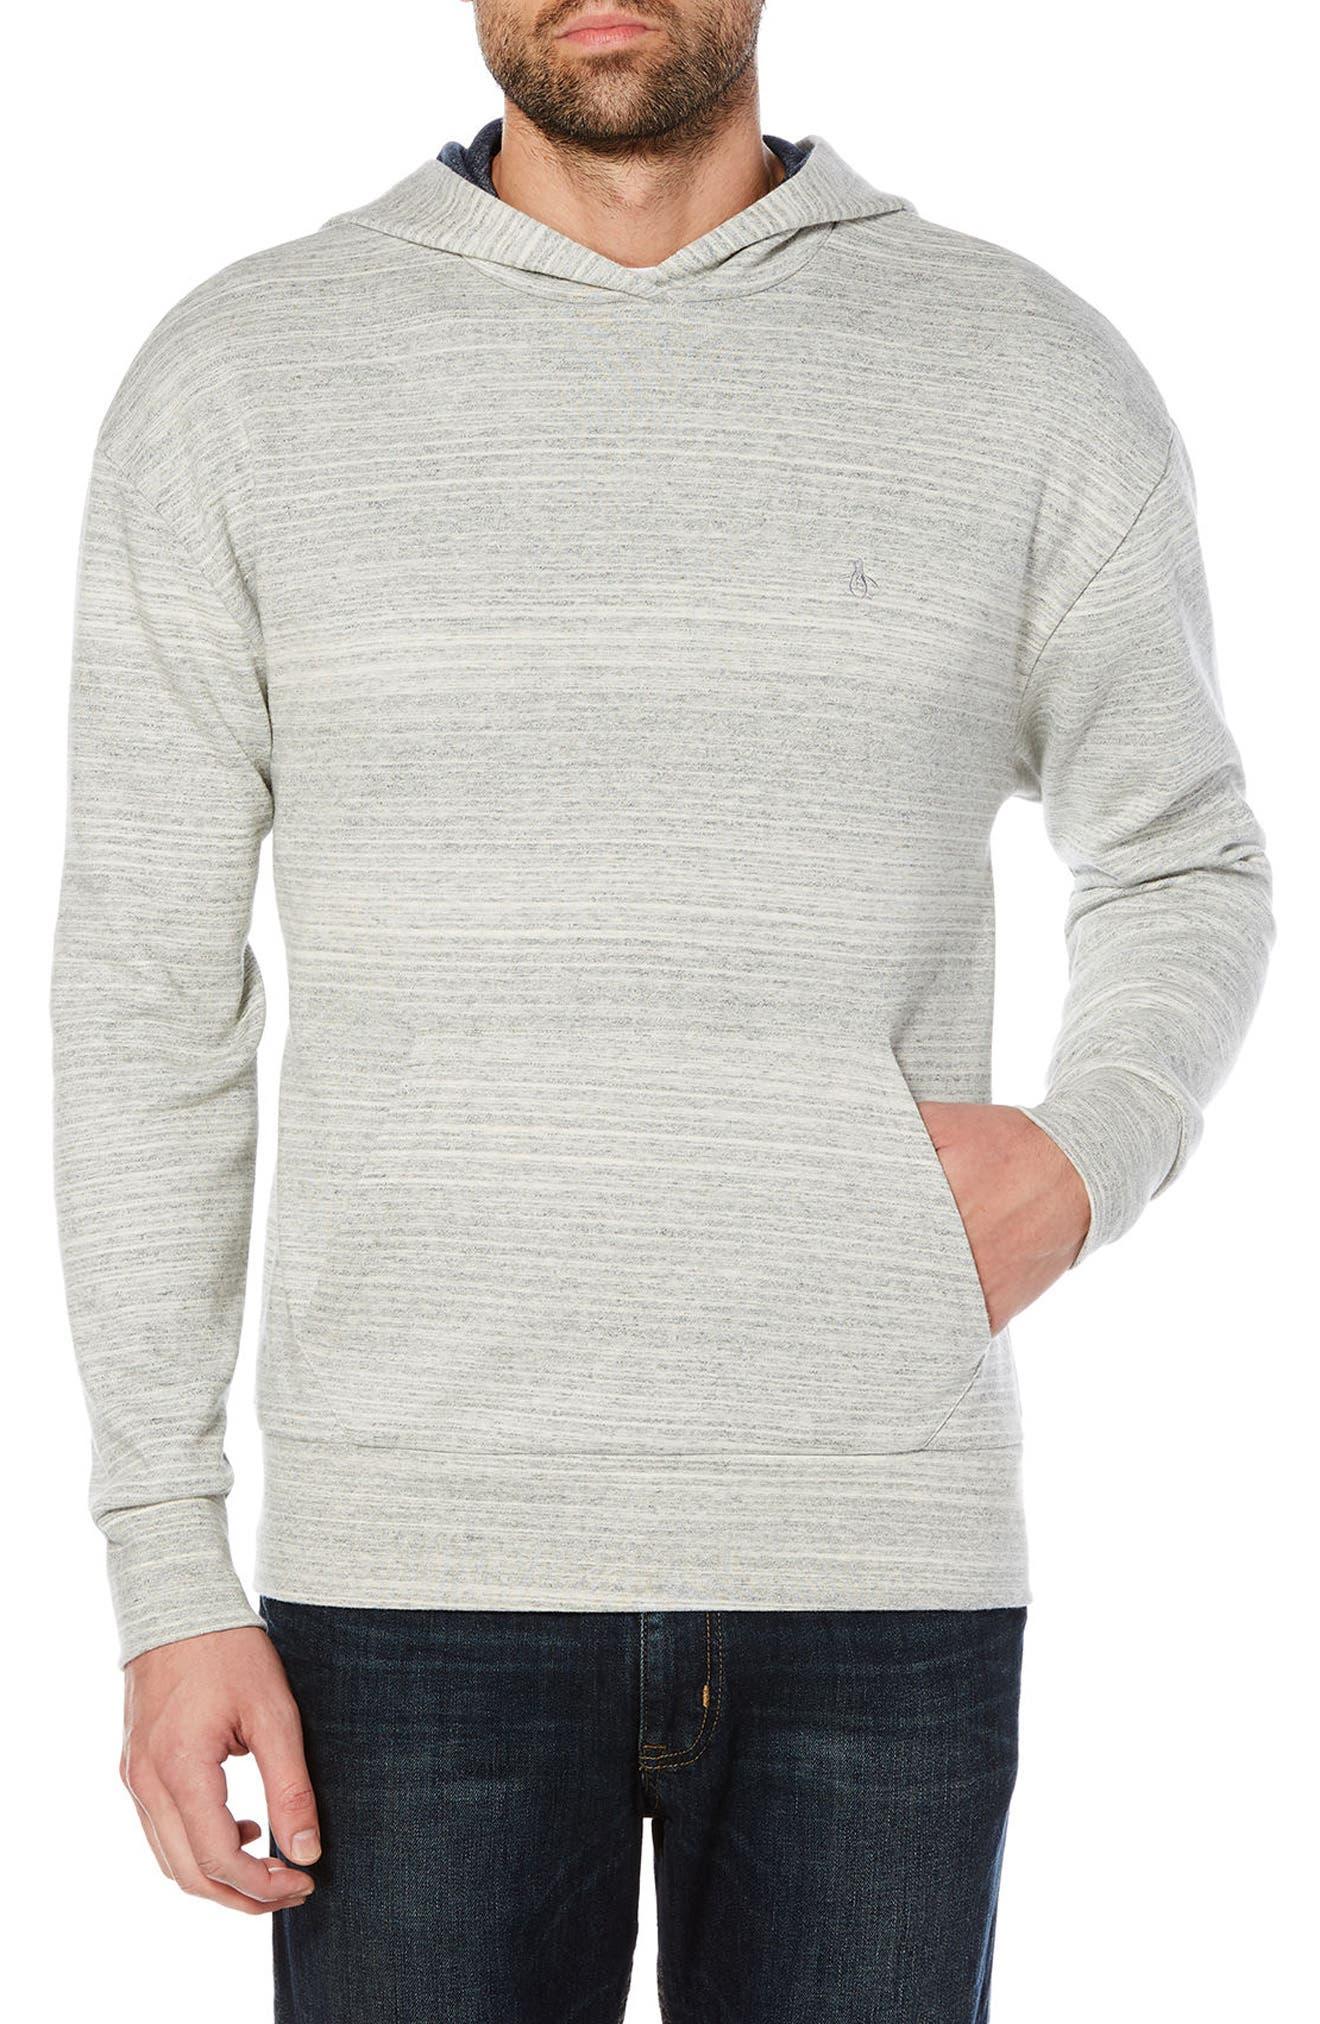 Original Penguin Hooded Sweater